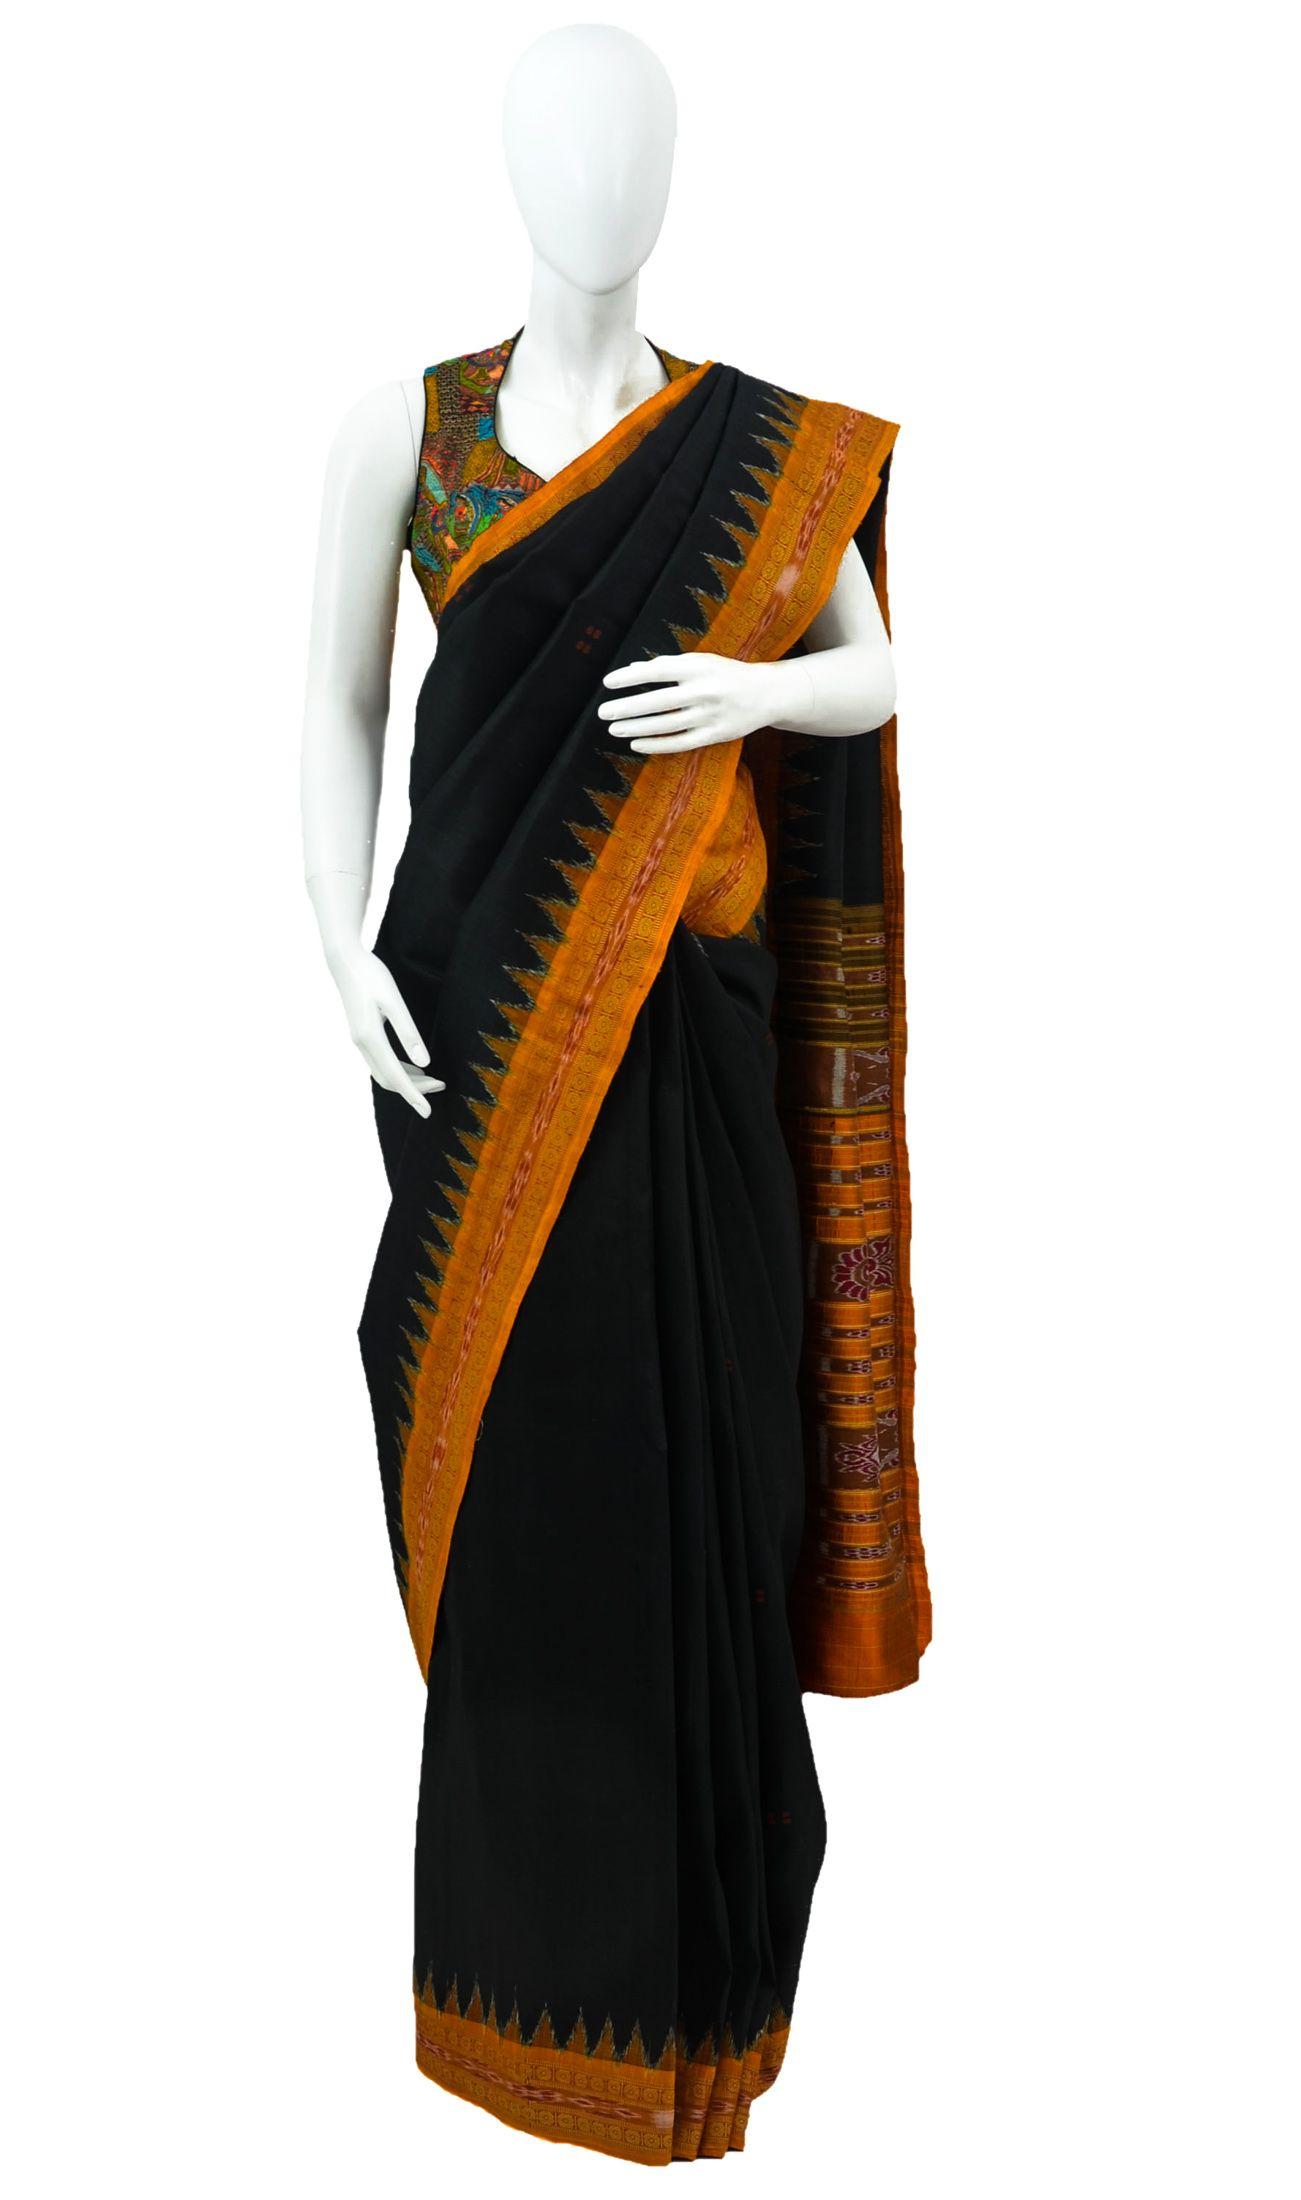 Pure silk saree pin by vibha singhal on handwoven silk ikat sarees  pinterest